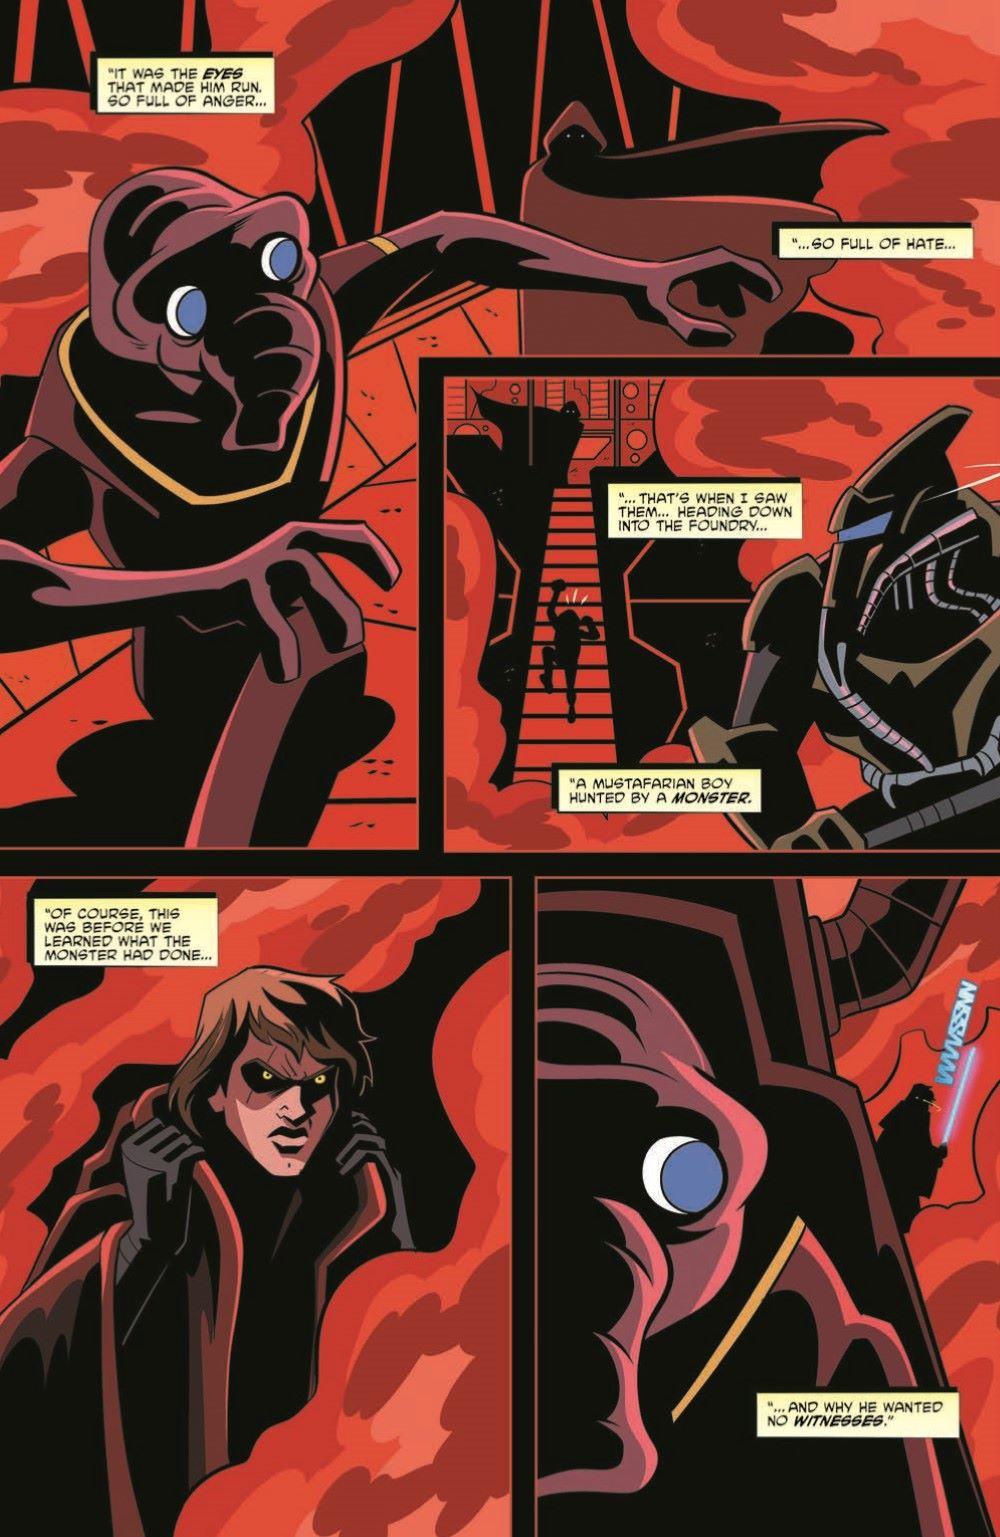 SW_ShadowOfVadersCastle_01-pr-4 ComicList Previews: STAR WARS ADVENTURES SHADOW OF VADER'S CASTLE #1